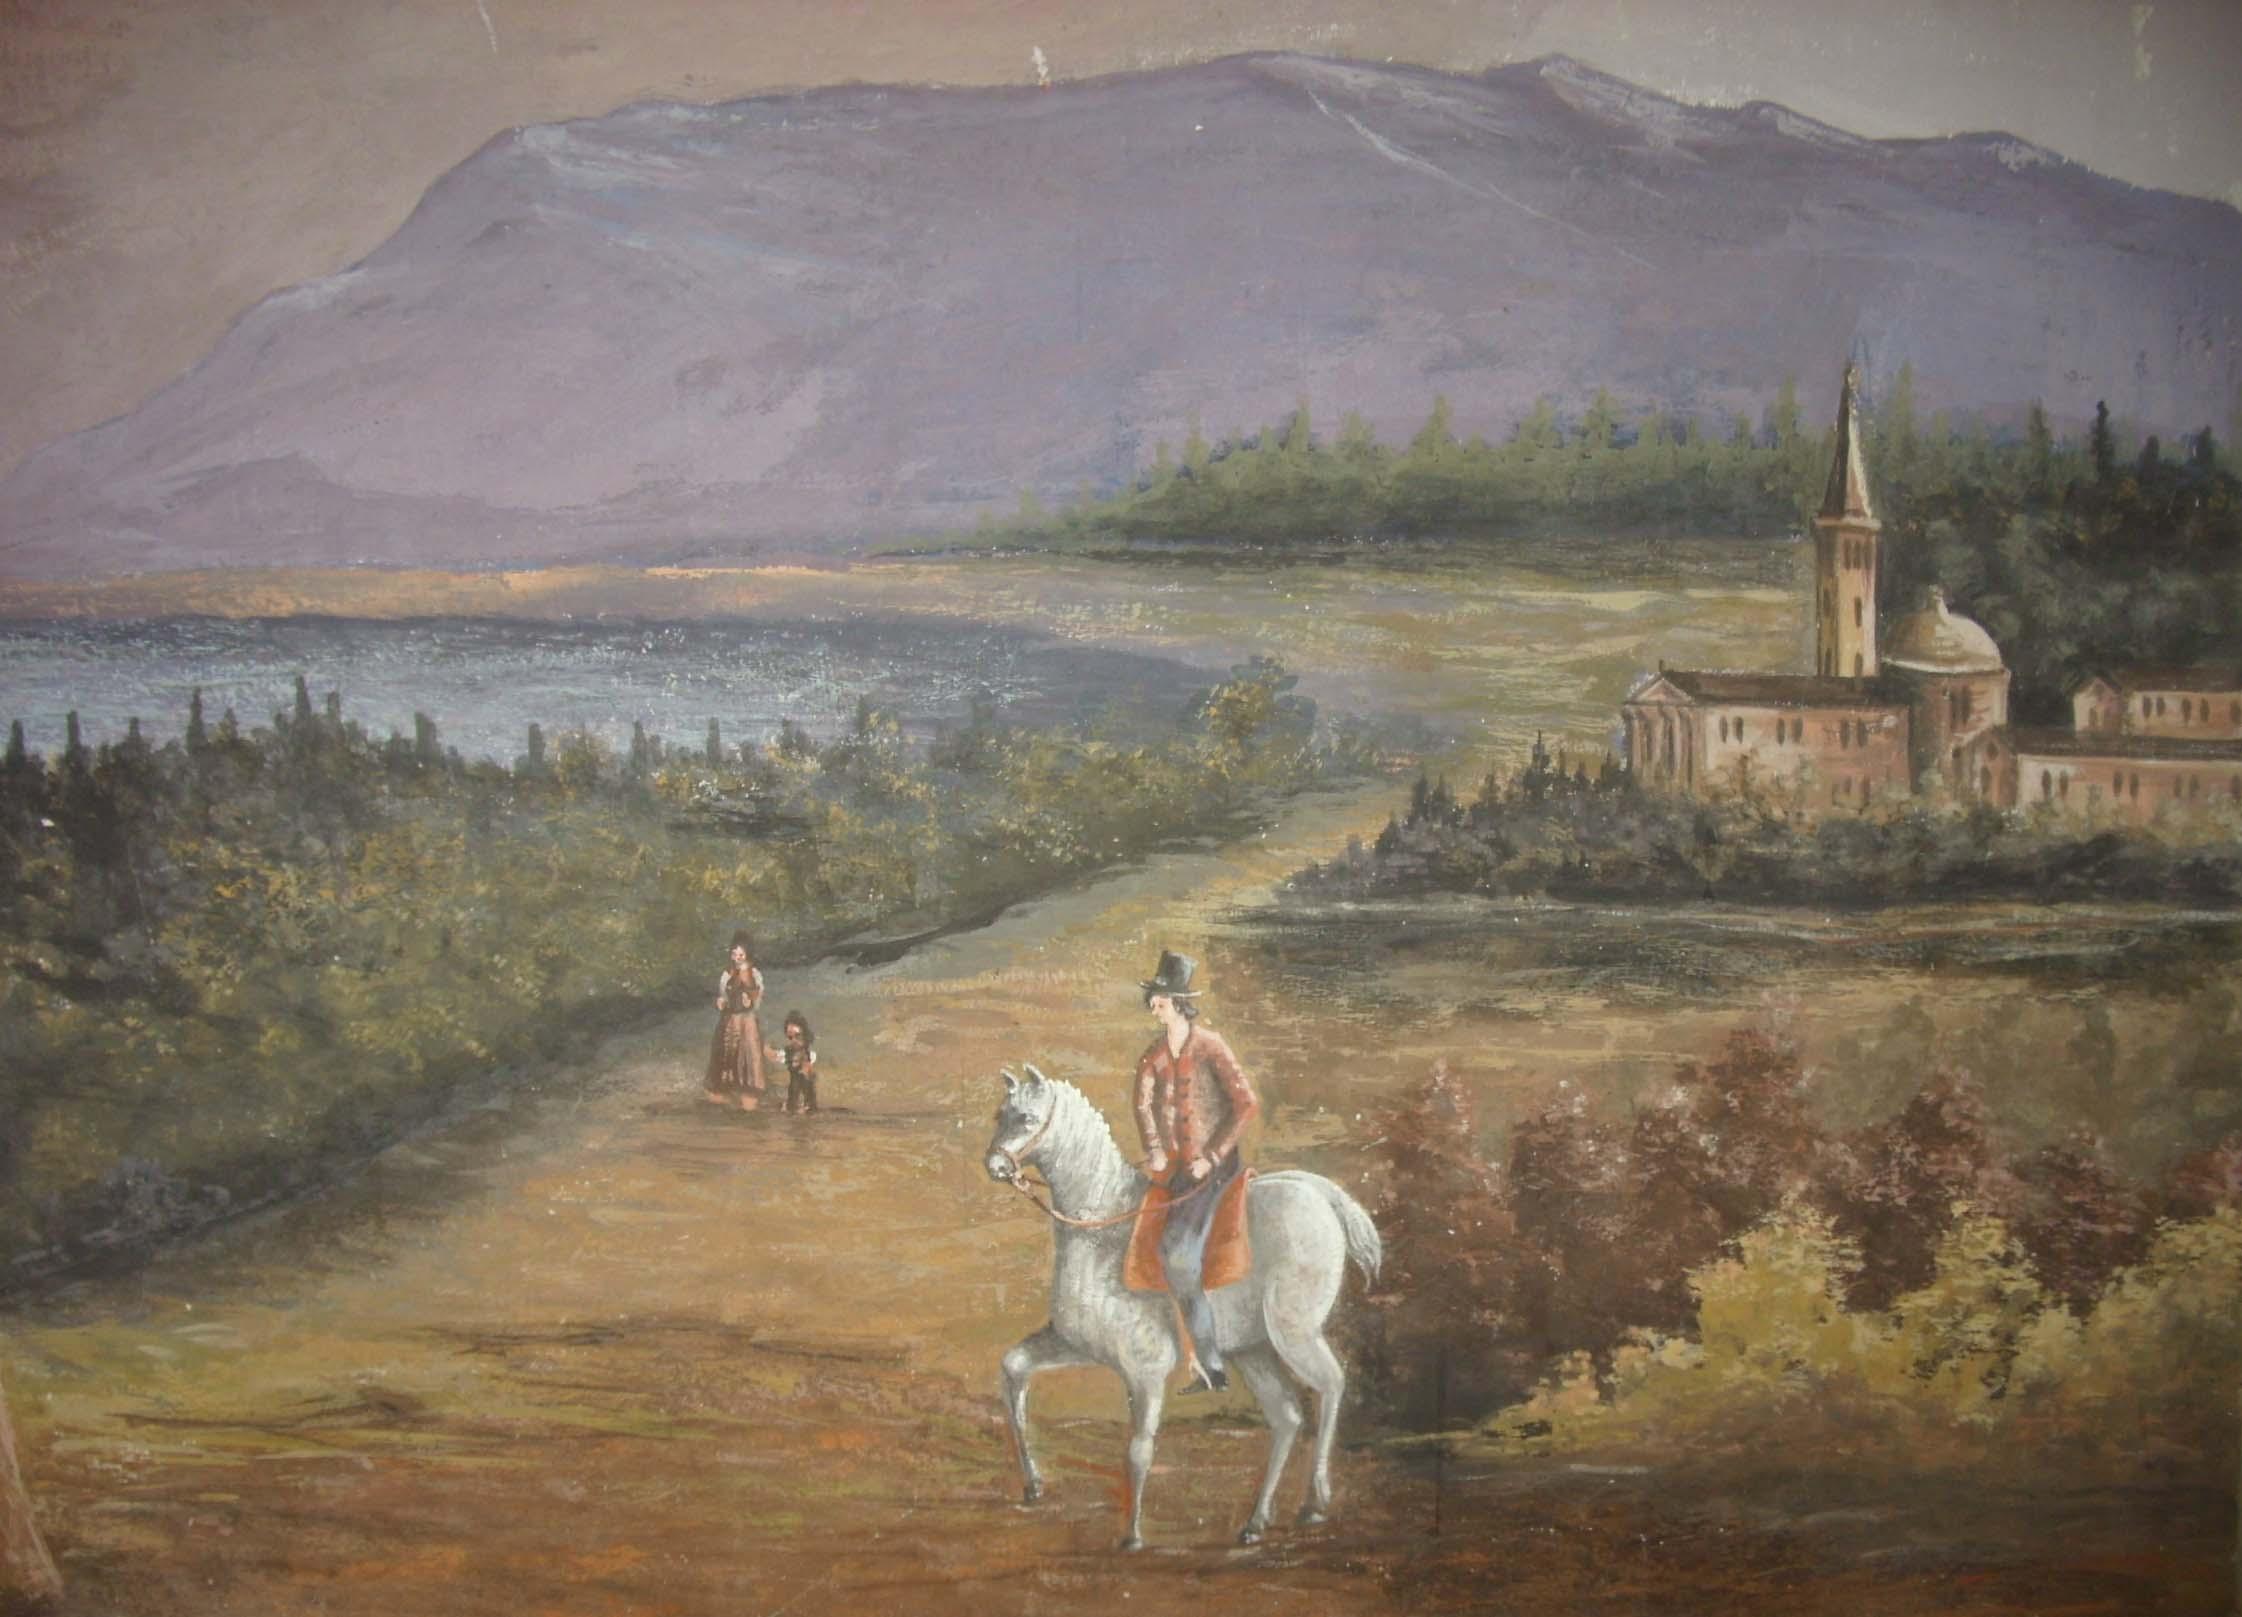 Affresco vedute a cavallo